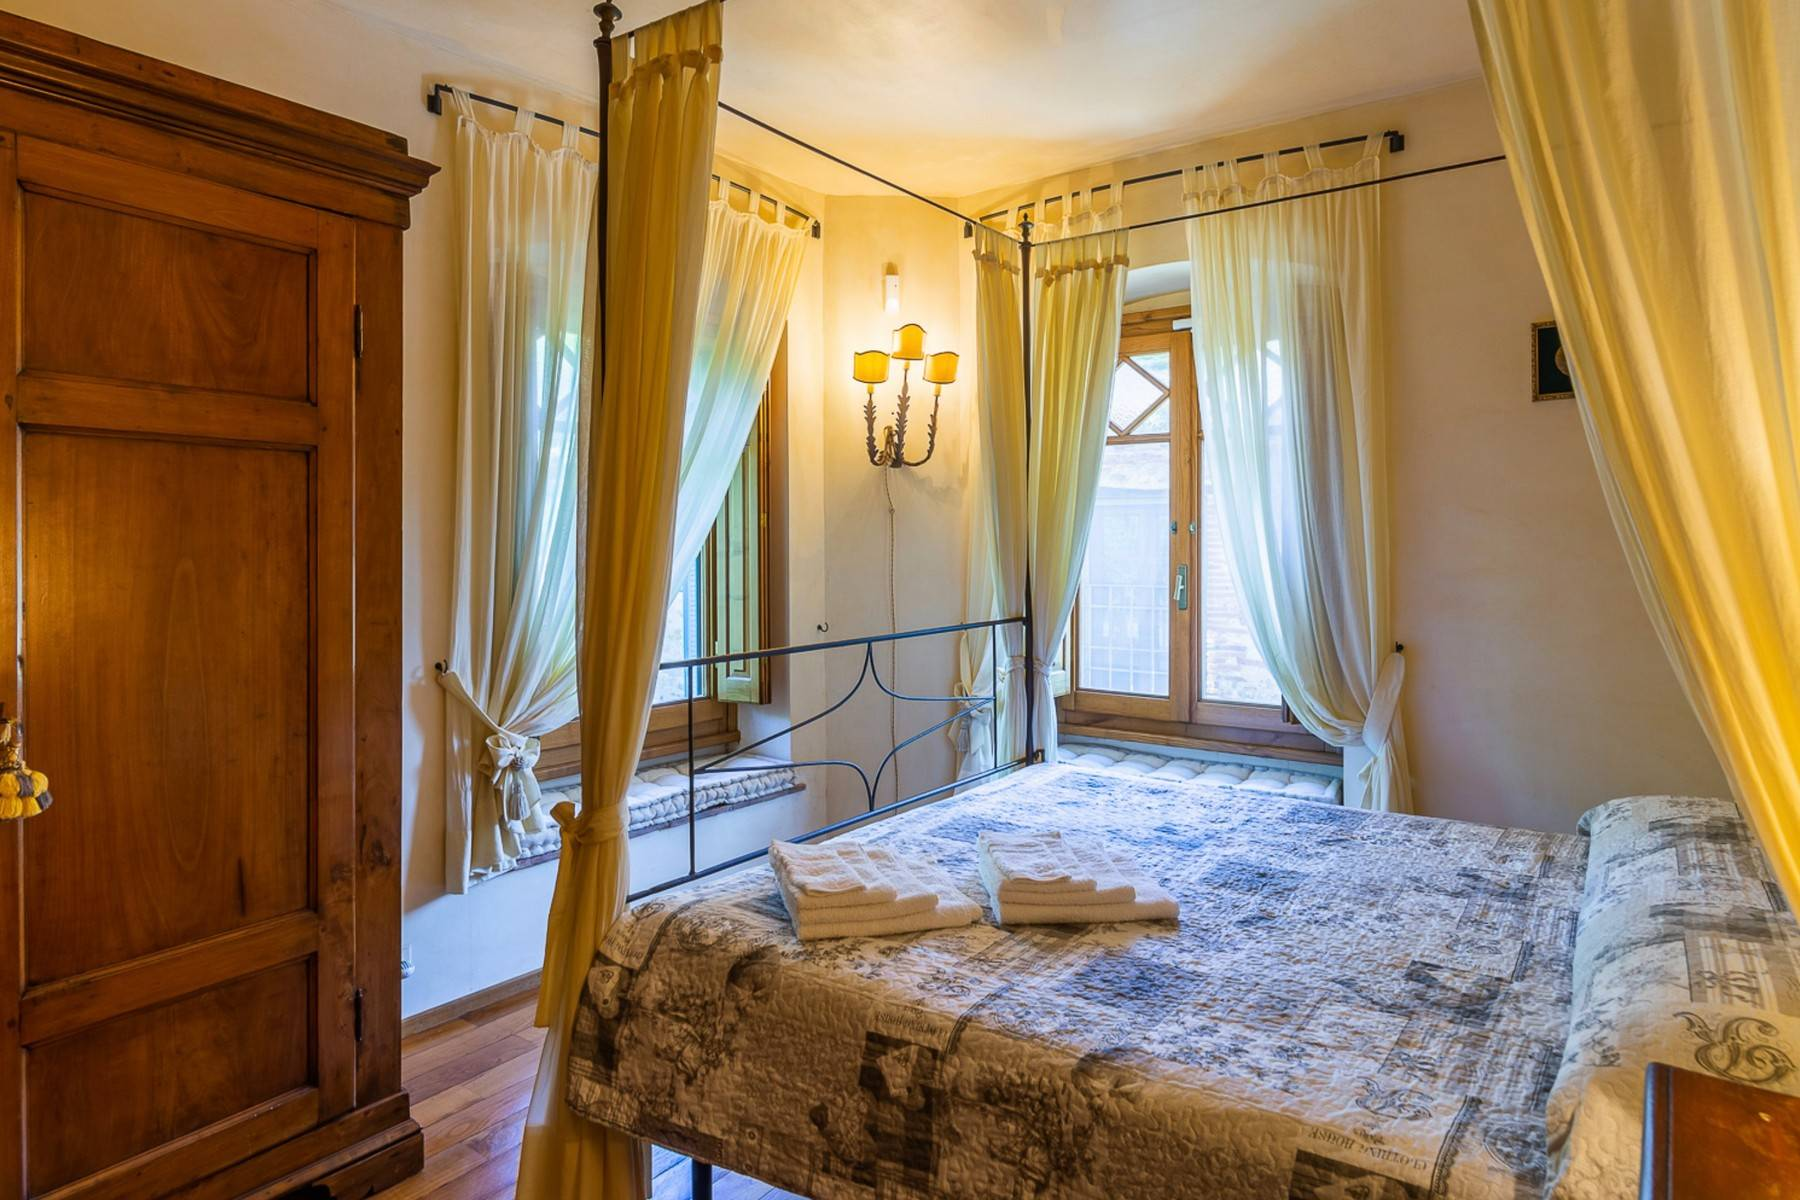 Villa in Vendita a Lucca: 5 locali, 1130 mq - Foto 27